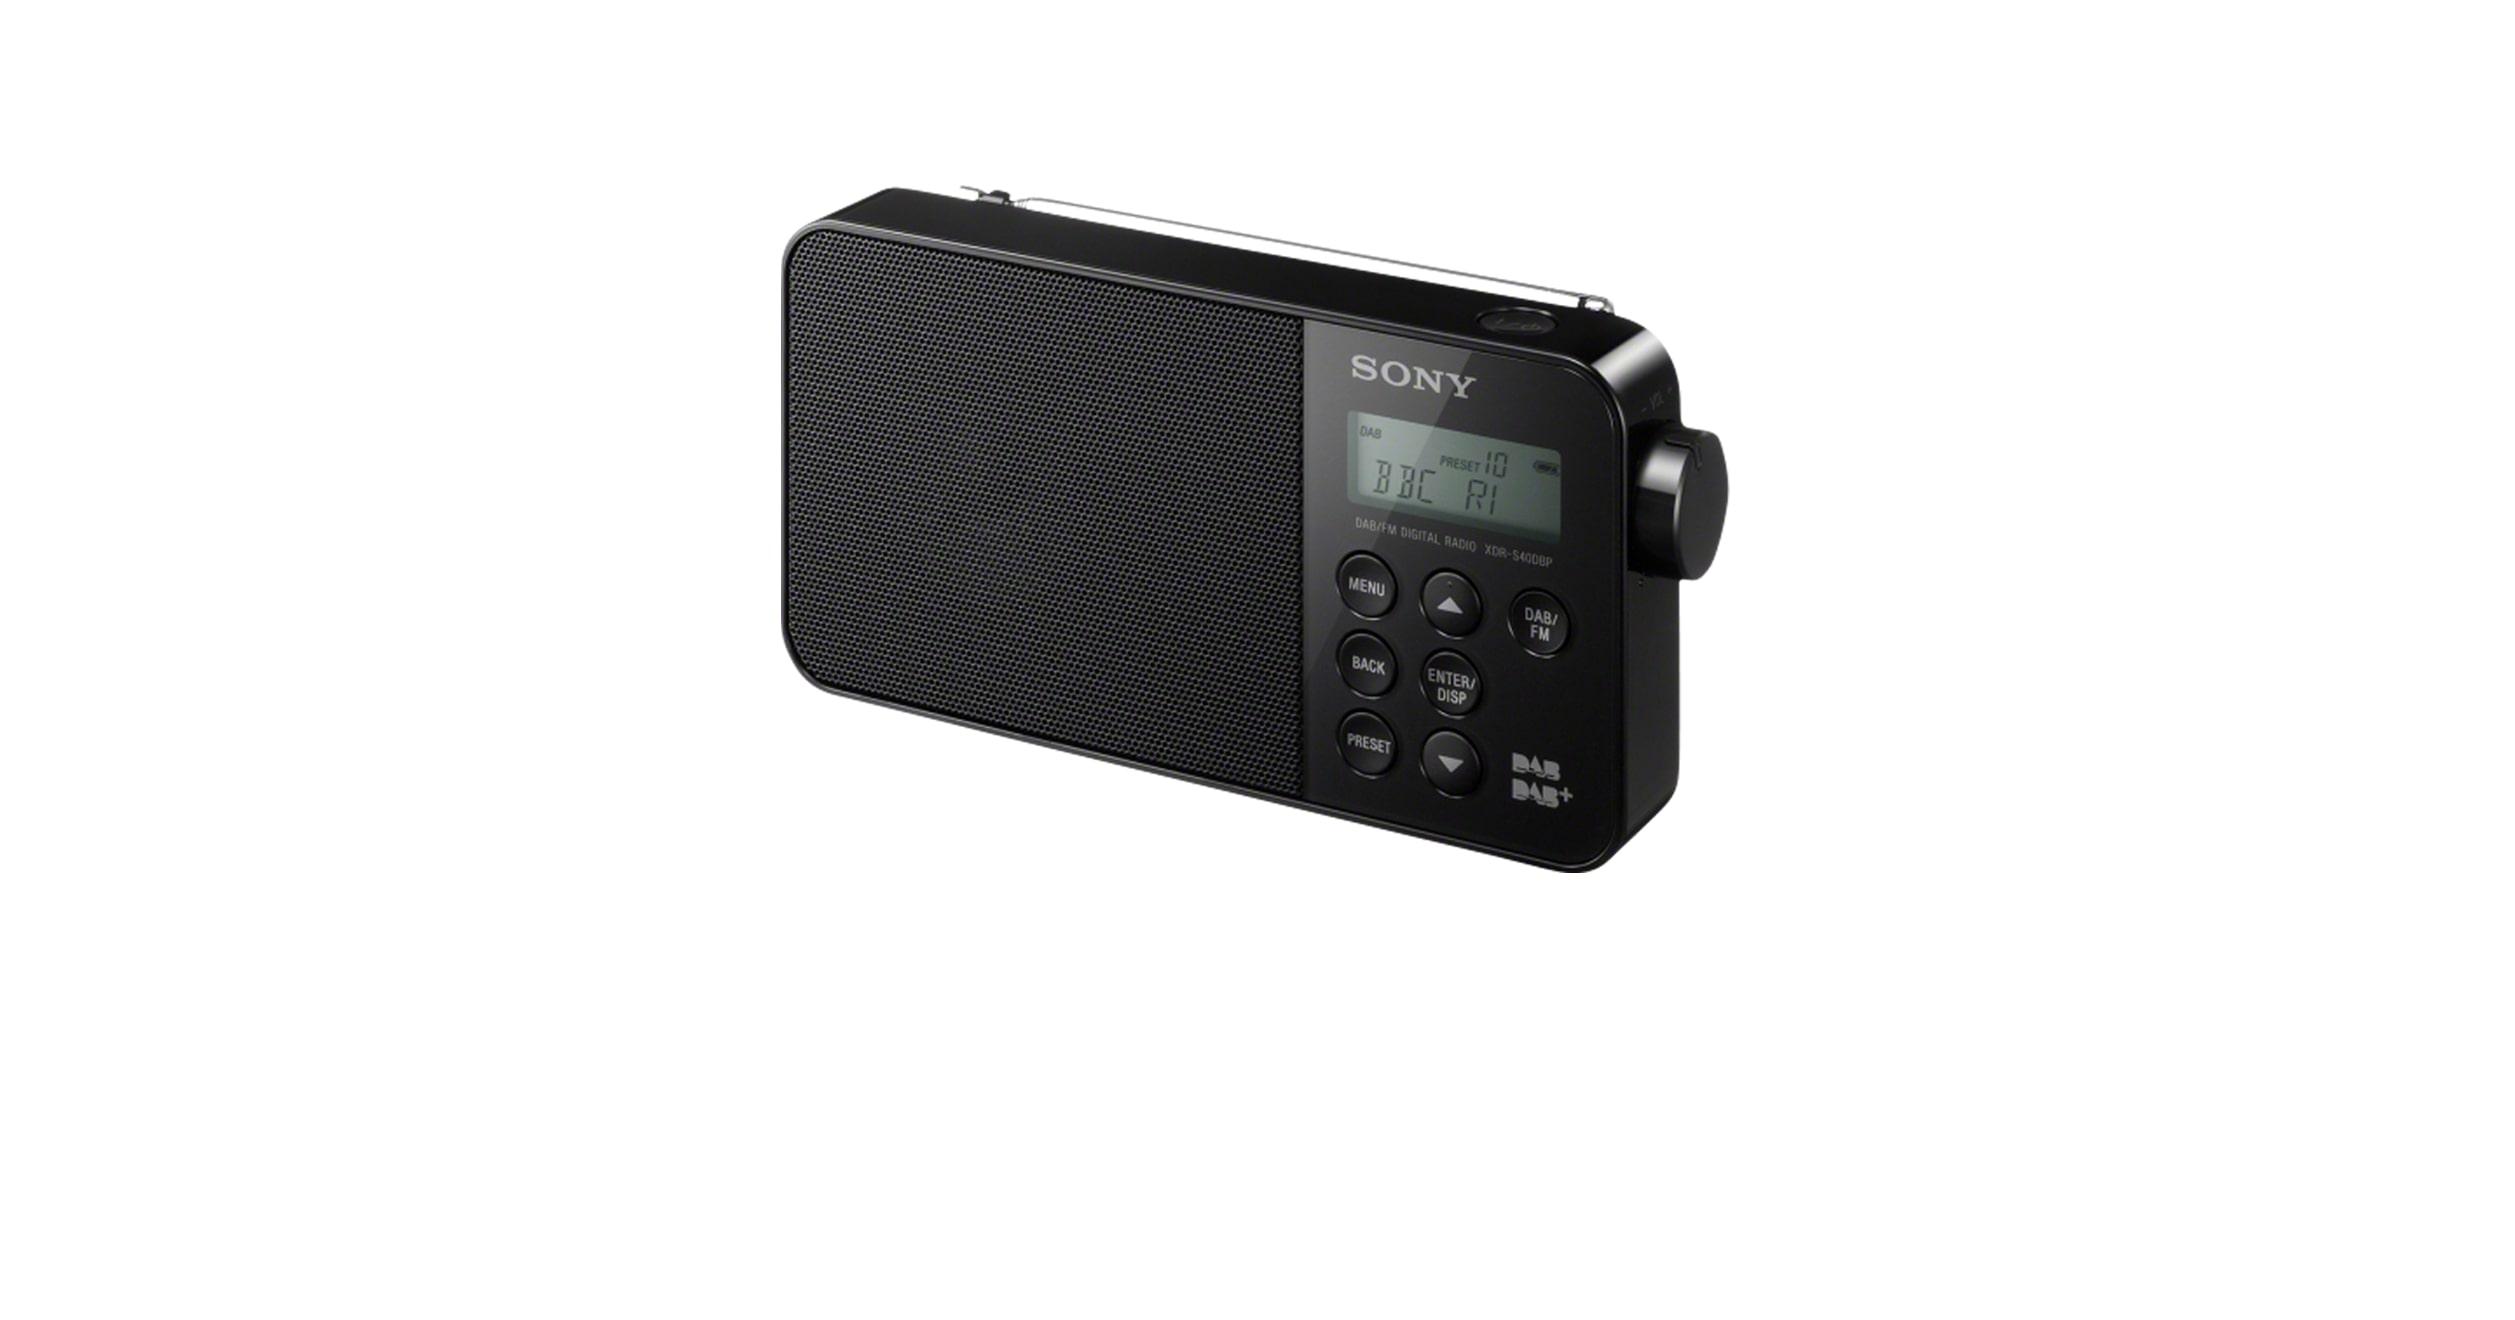 tragbares digitales dab radio xdr s40dbp sony de. Black Bedroom Furniture Sets. Home Design Ideas